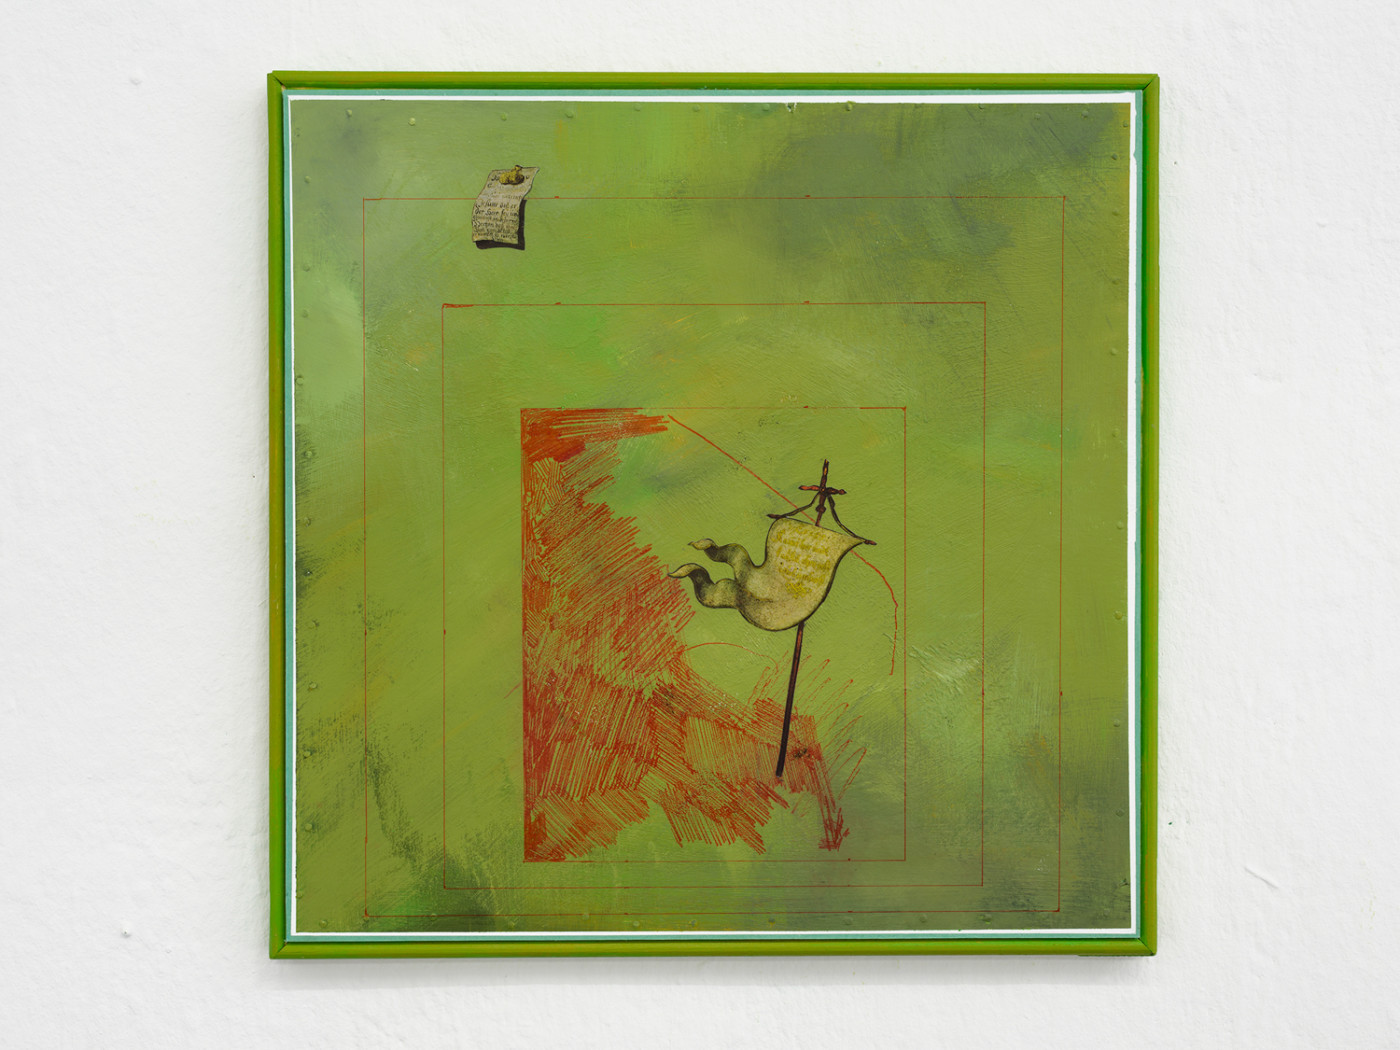 BRADLEY KRONZ  Long Hallway - Medicine , 2018 Marker, acrylic, collage, millboard, wood 43 x 43 cm / 17 x 17 in - High Art Gallery Paris